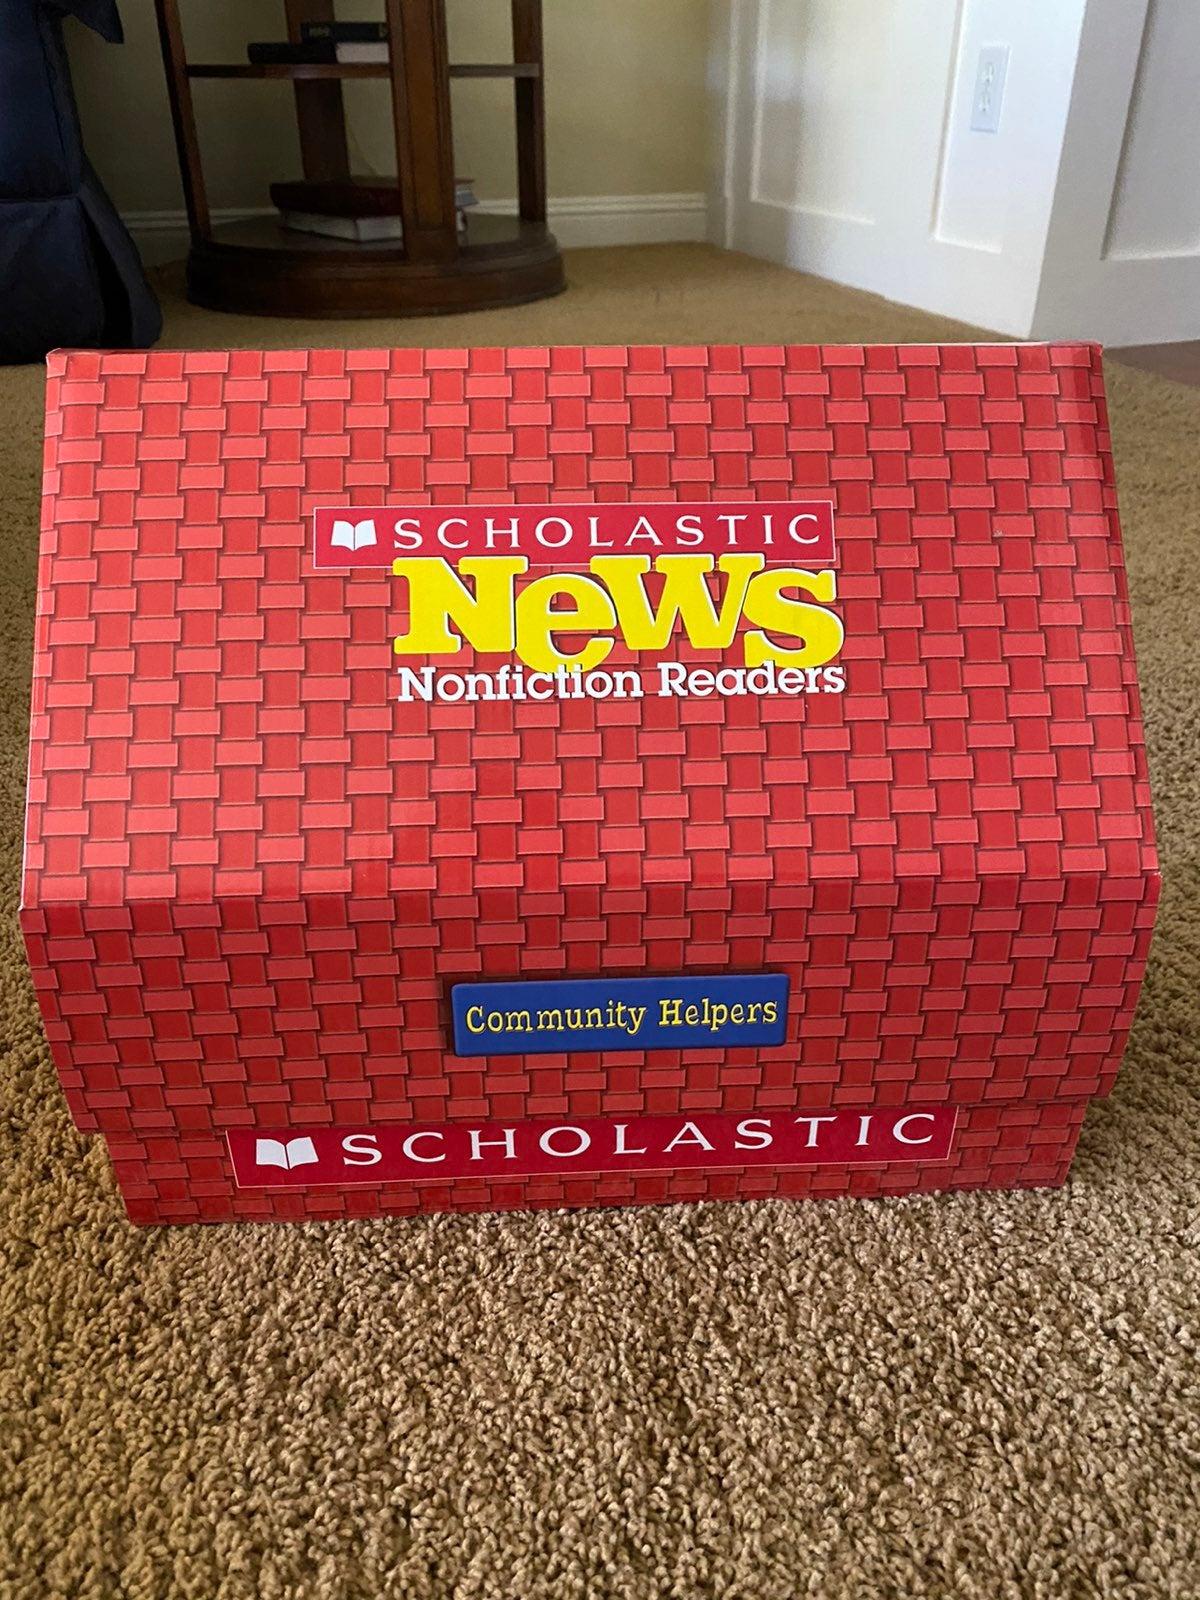 Scholastic News community helpers books